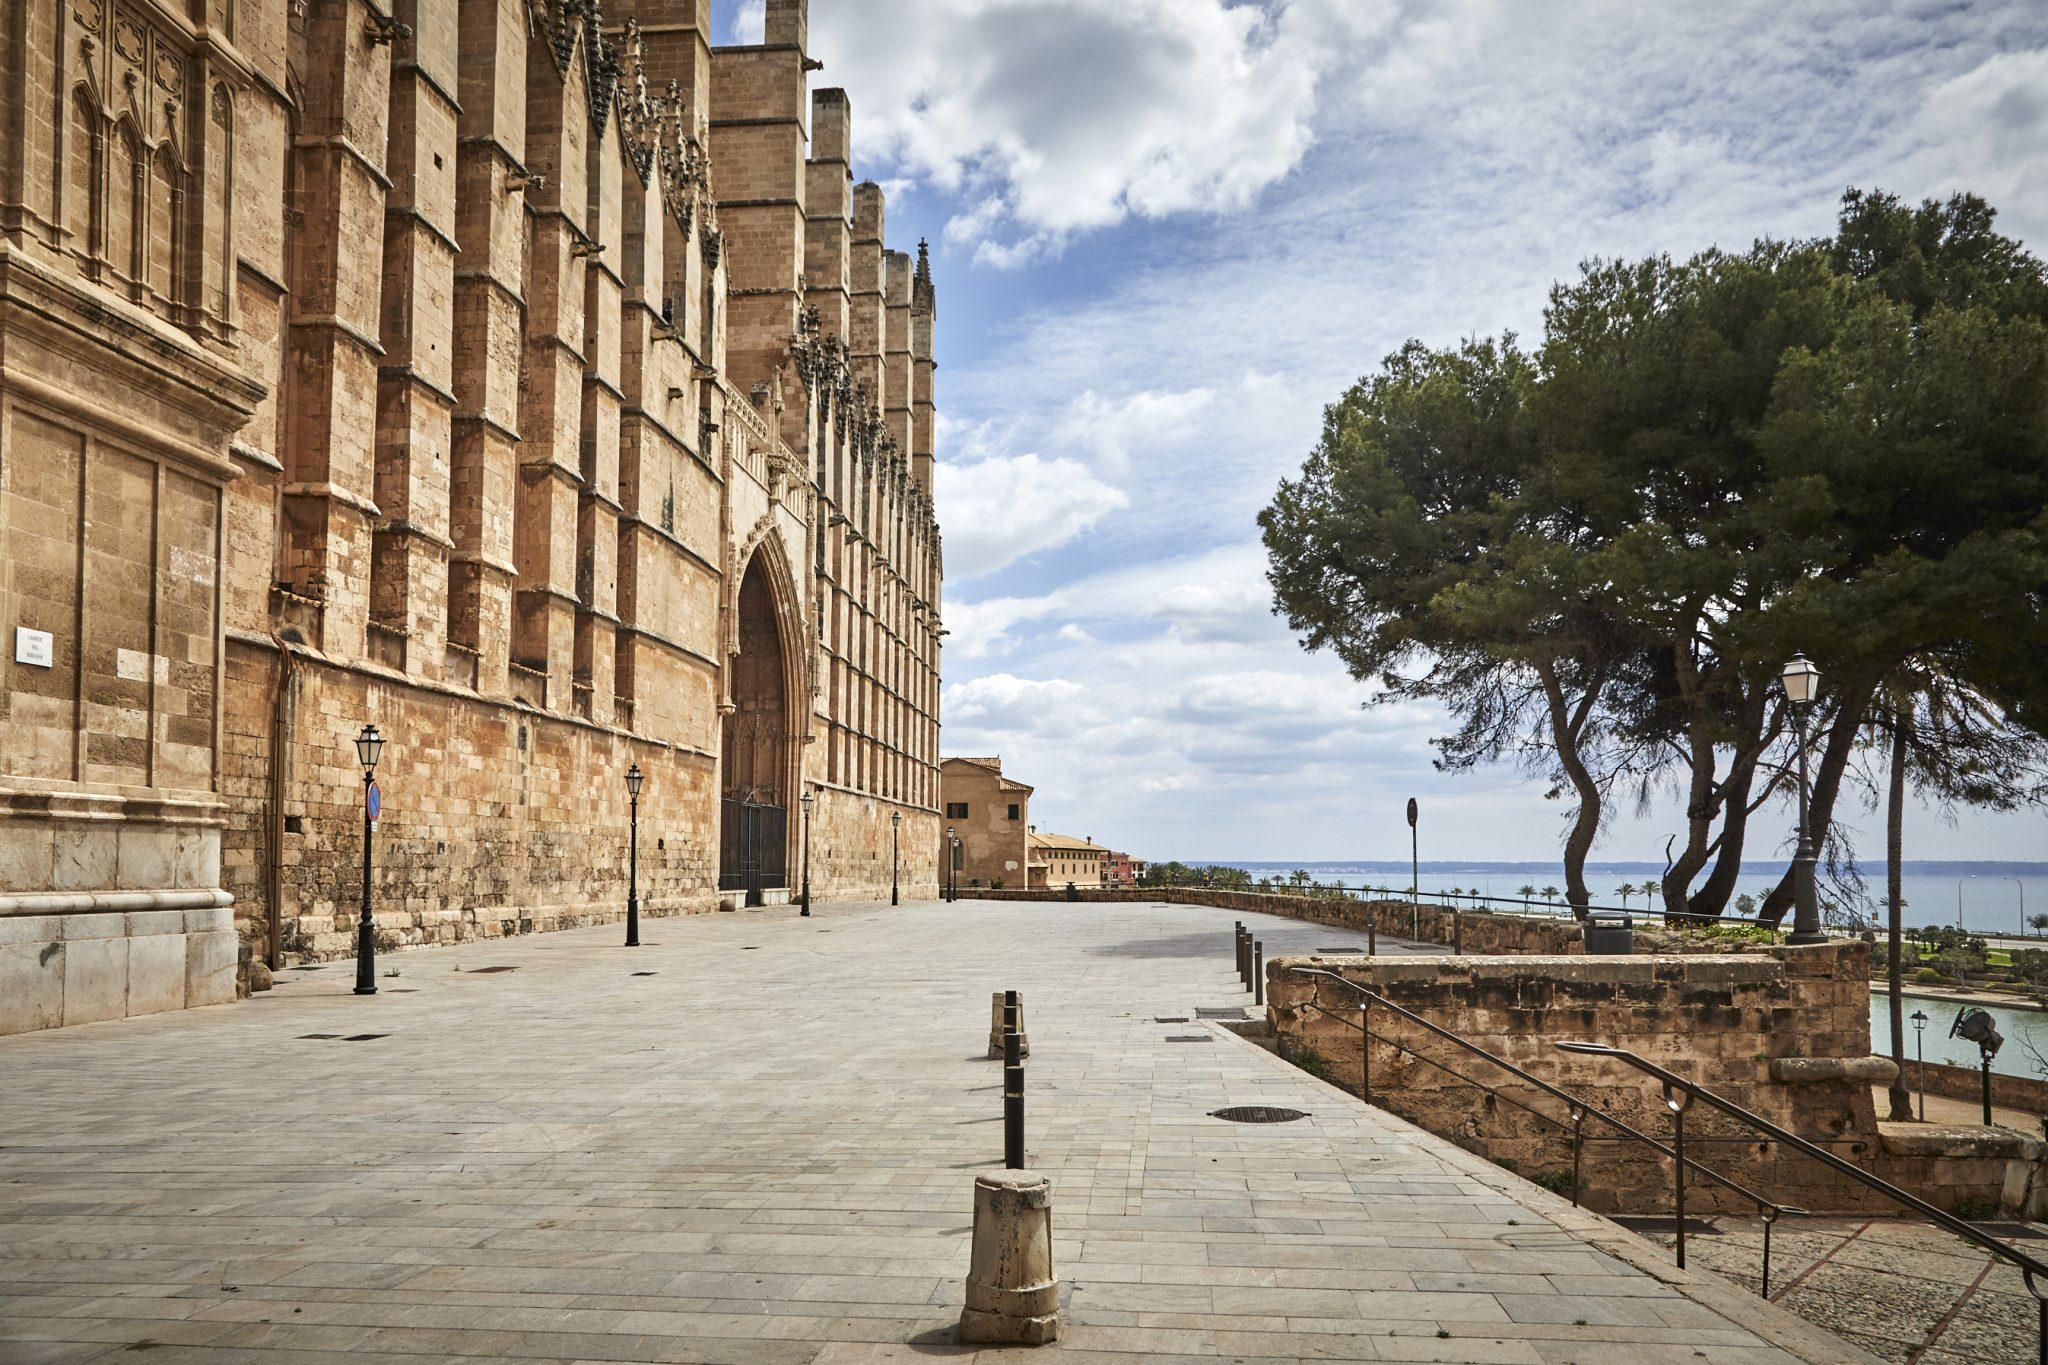 11_RifSpahni_Mallorca Covid_20_A2A0004